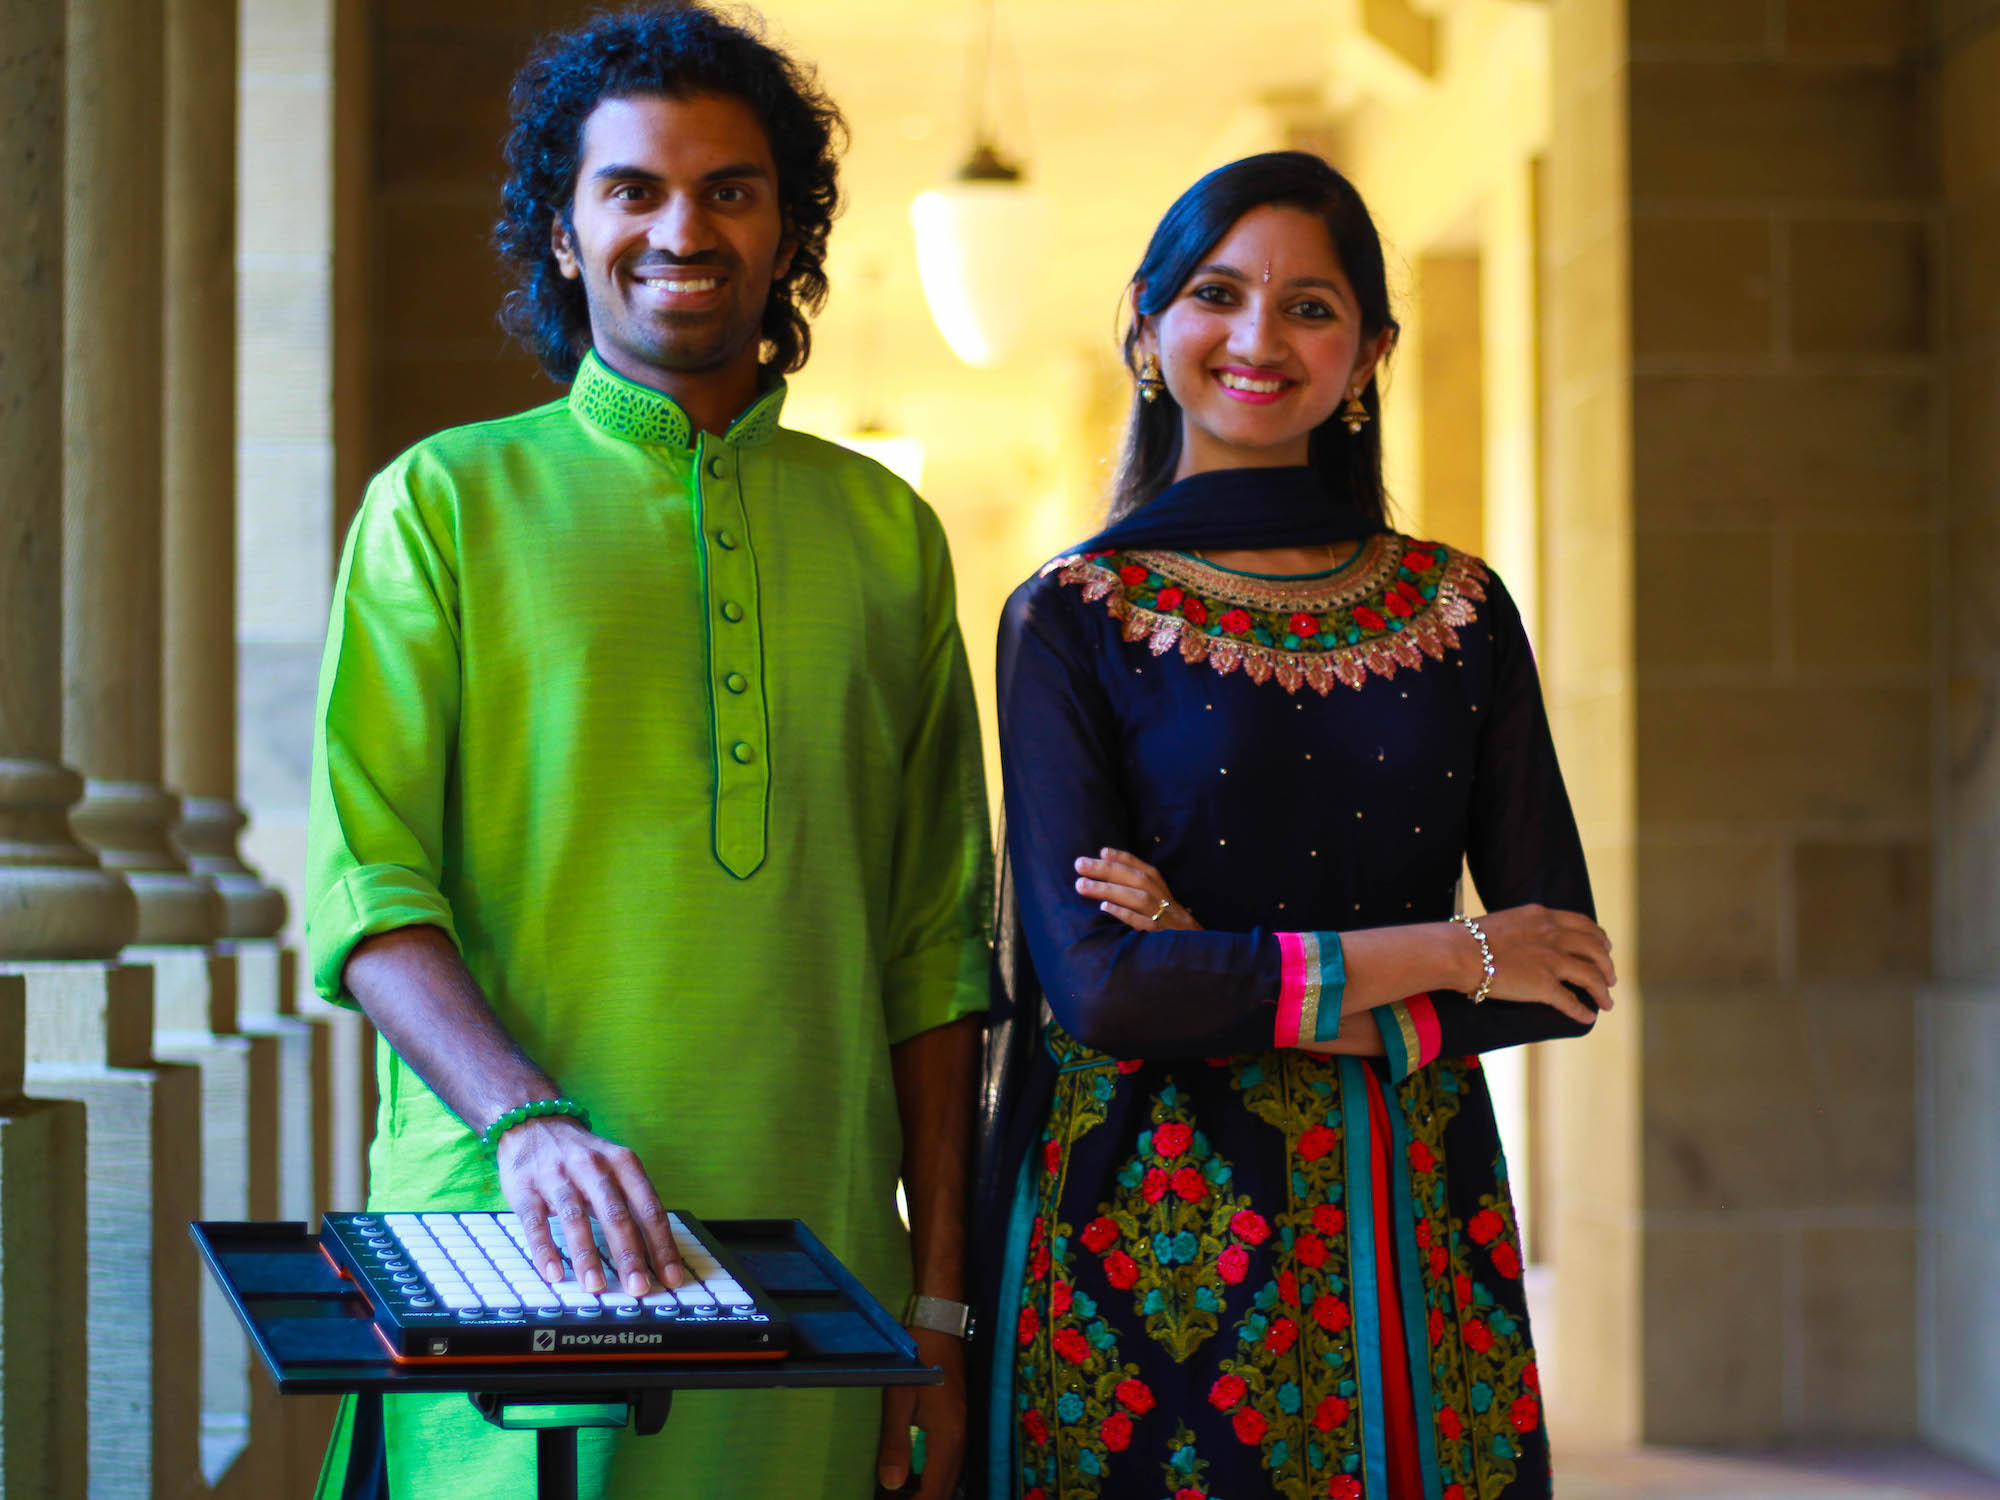 Hindu Hymns: Ancient Yet Modern Inspirational Music